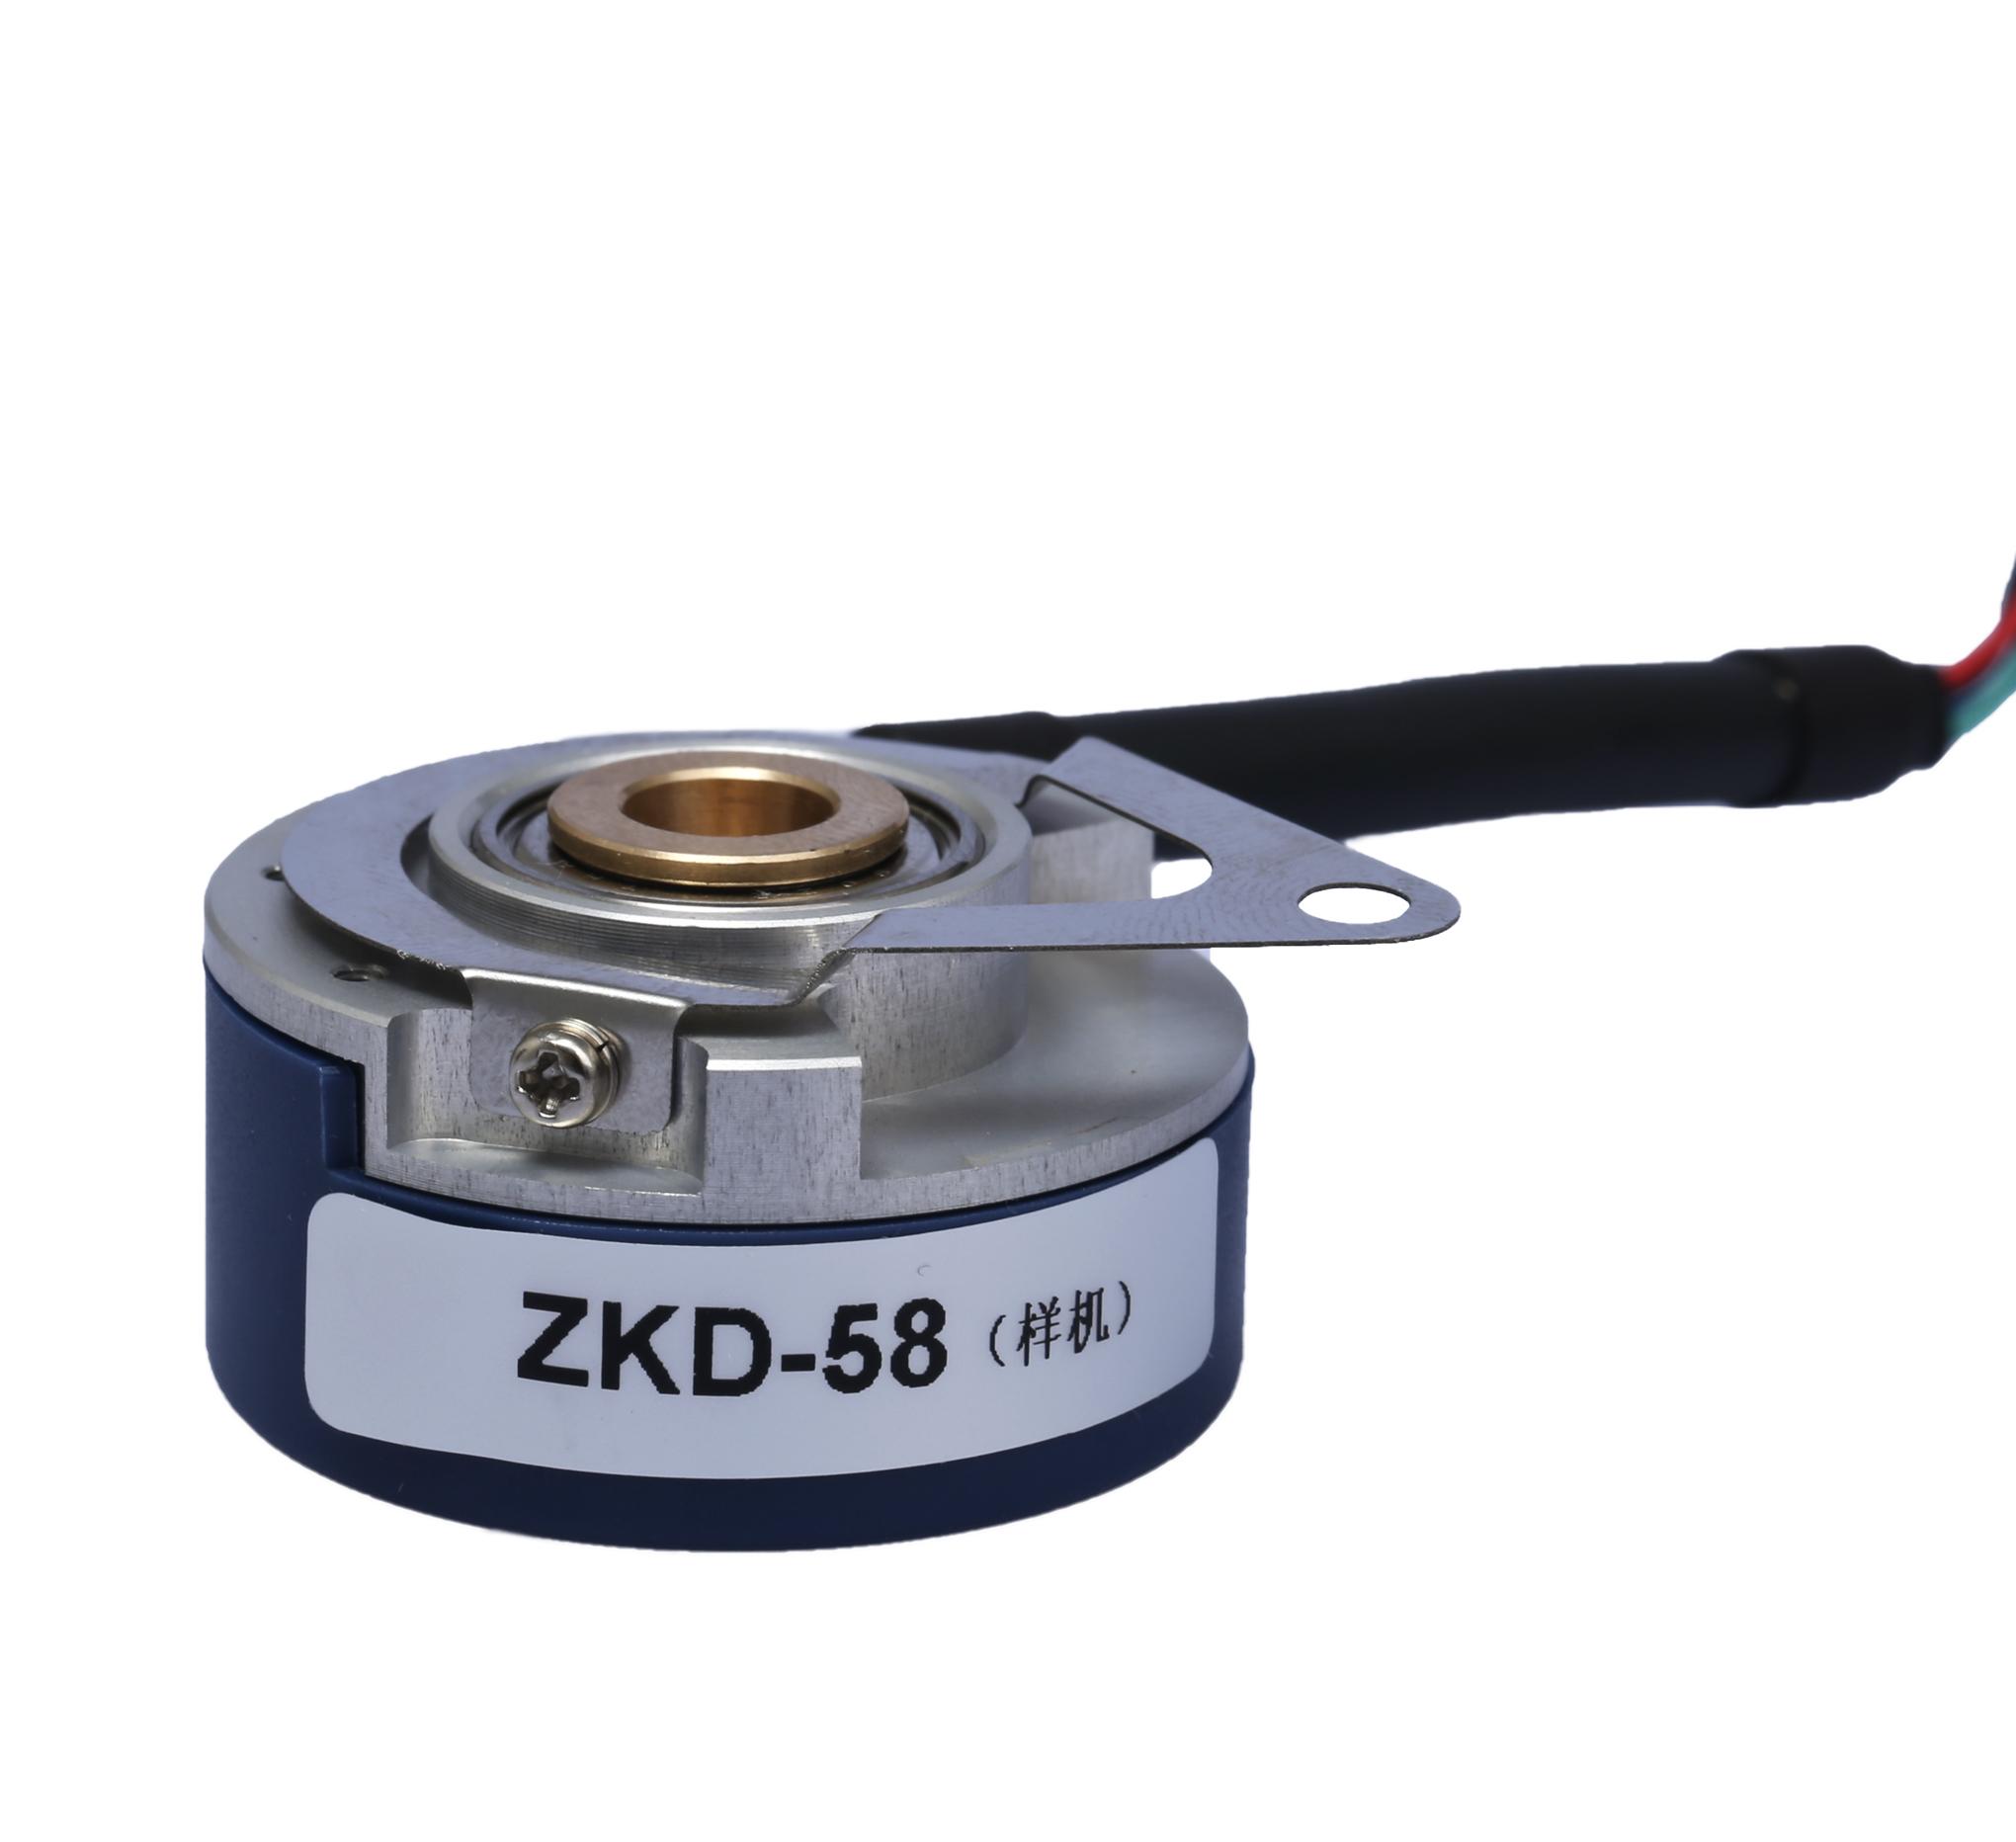 ZKD-58 增量式光栅旋转编码器 禹衡光学